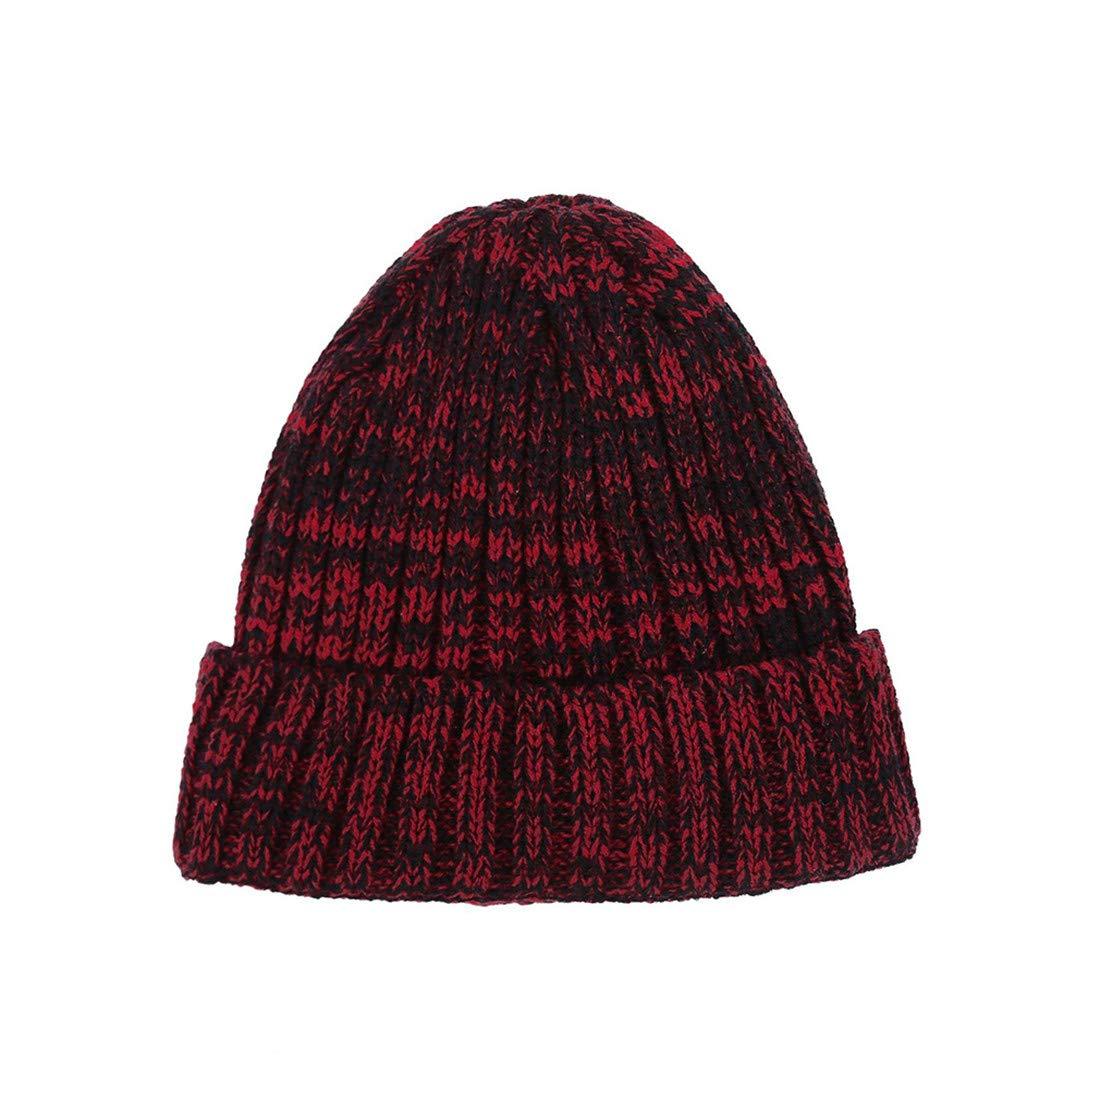 5d62ece5ffcd7a Hüte Dunkelrot VWH Damen Herren Mütze Wintermütze Weiche Mütze Warme Mütze  Damen